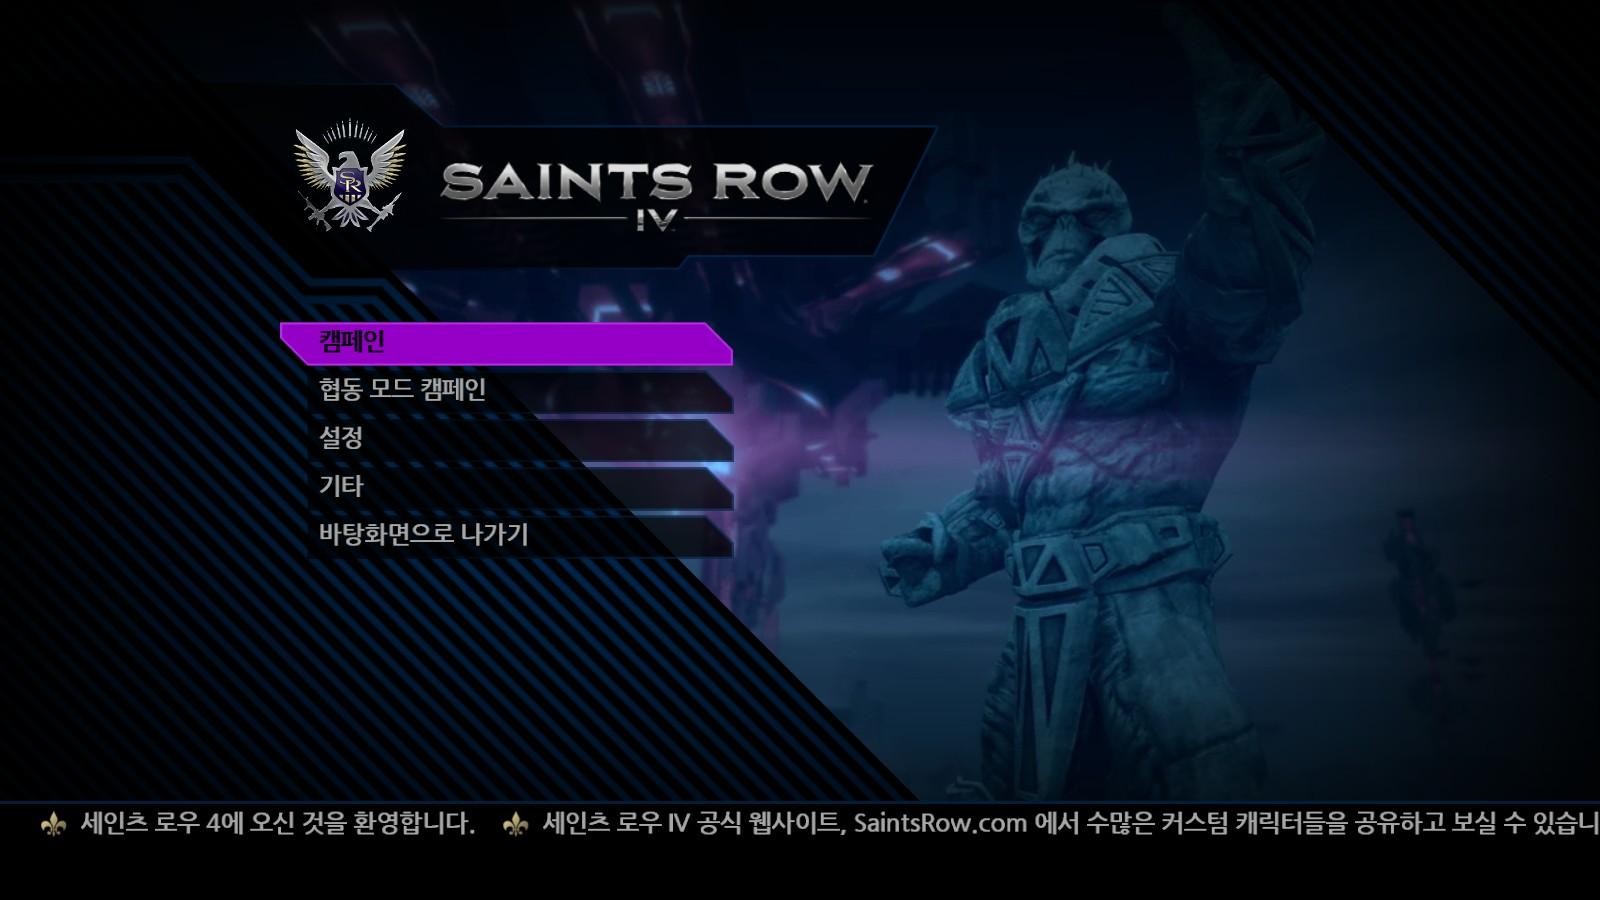 Saints Row IV 2020-11-21 01-09-00-253.jpg